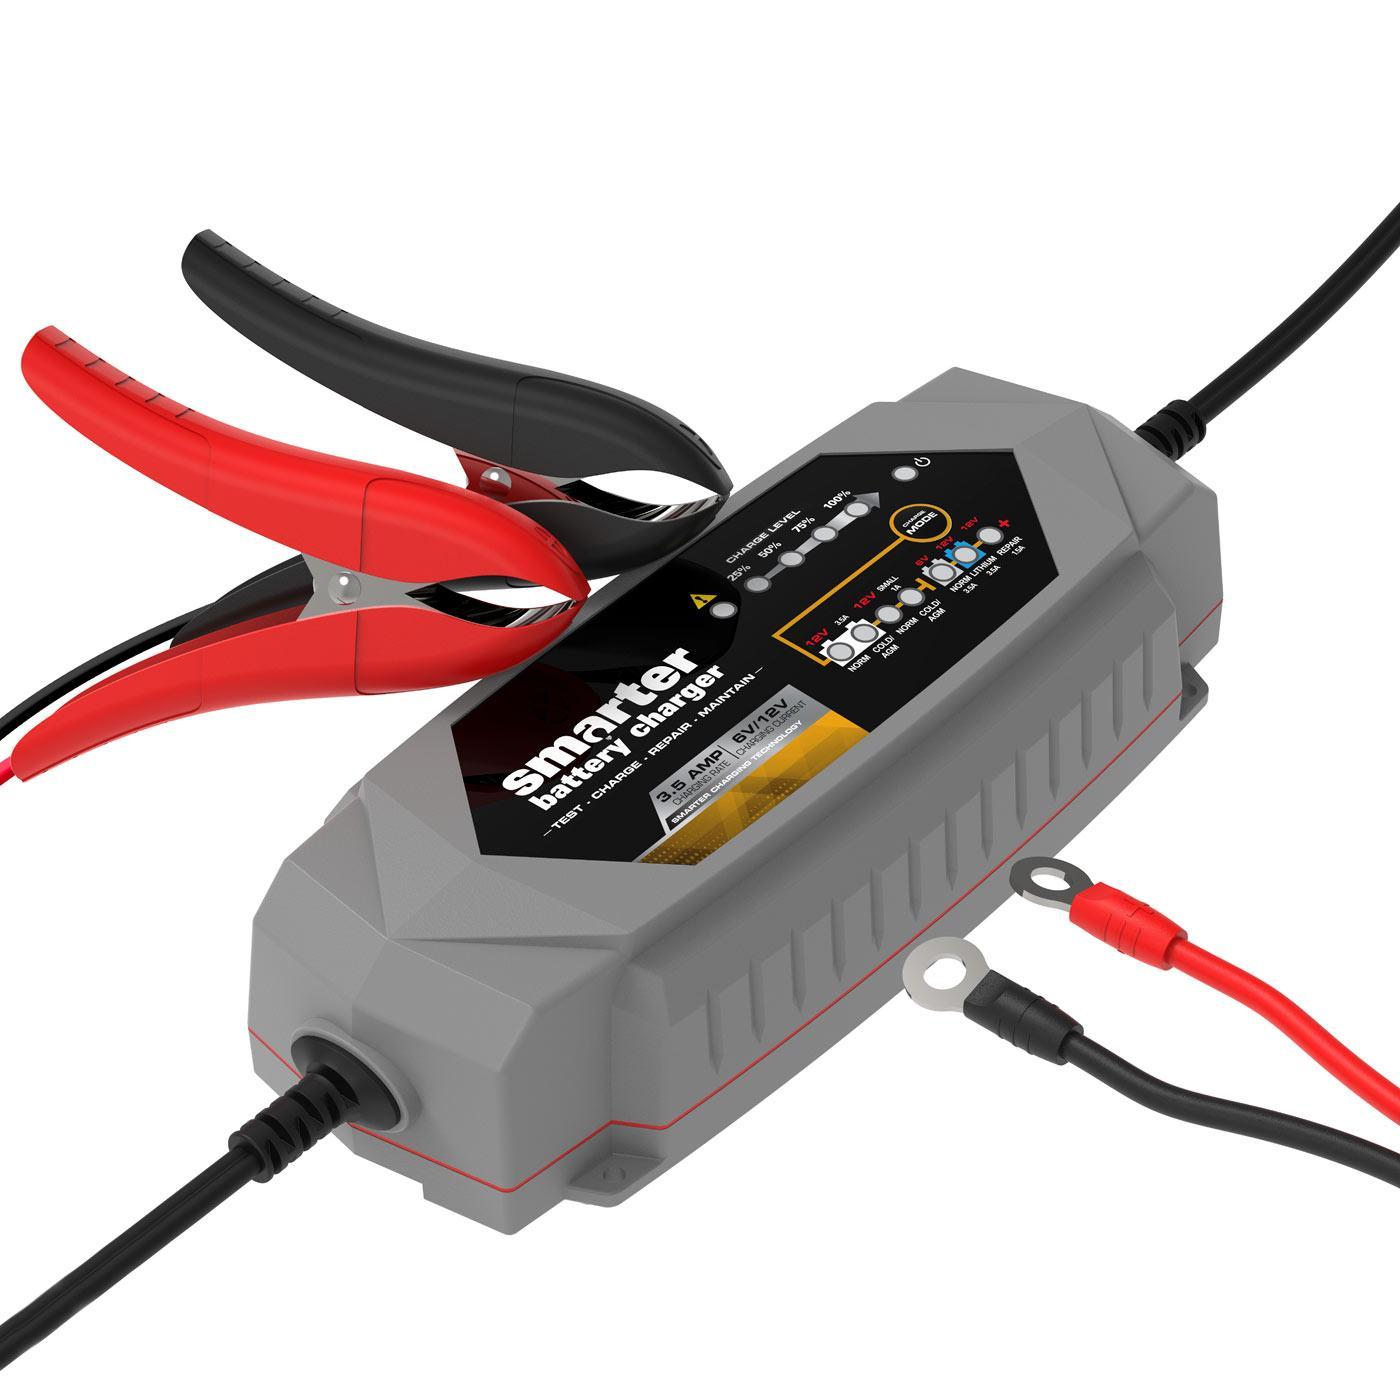 Smartech 6 12v 35a Smart Automotive Battery Charger New 6v Auto Electrical Circuit Tester Car Garage Equipment Light Mgctlbxnmzp Mgctlbxv525 Mgctlbxlc